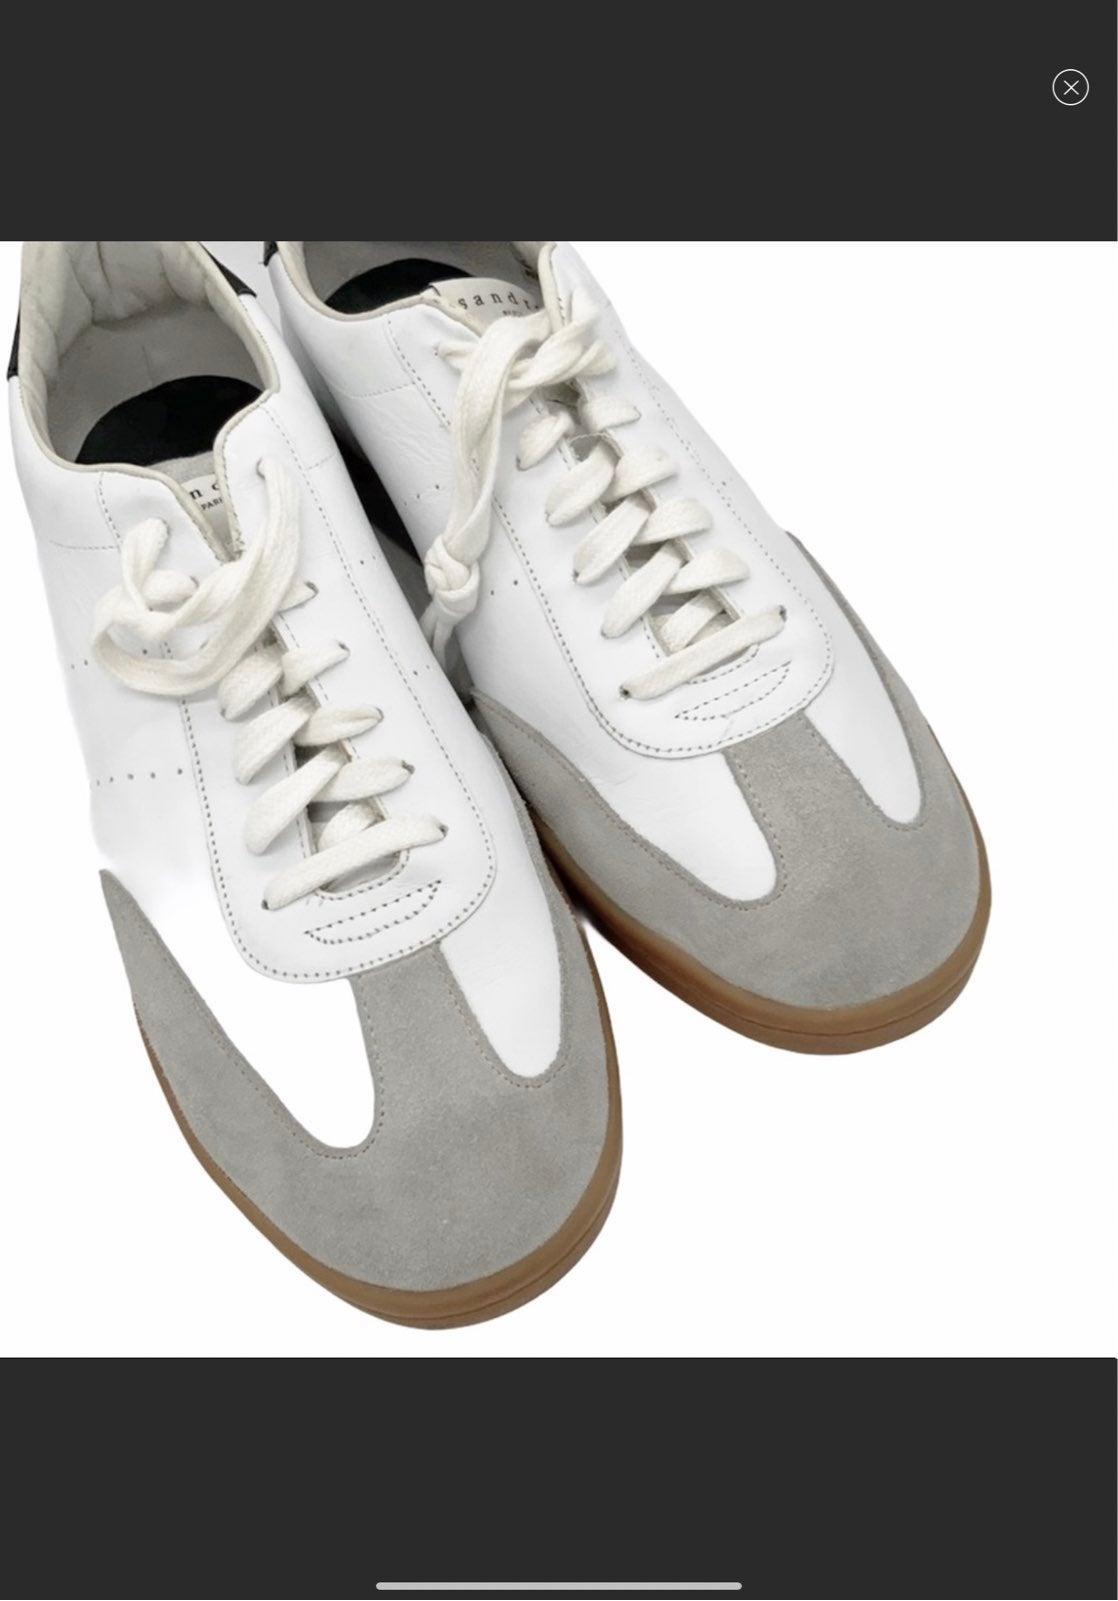 Sandro soccer sneakers